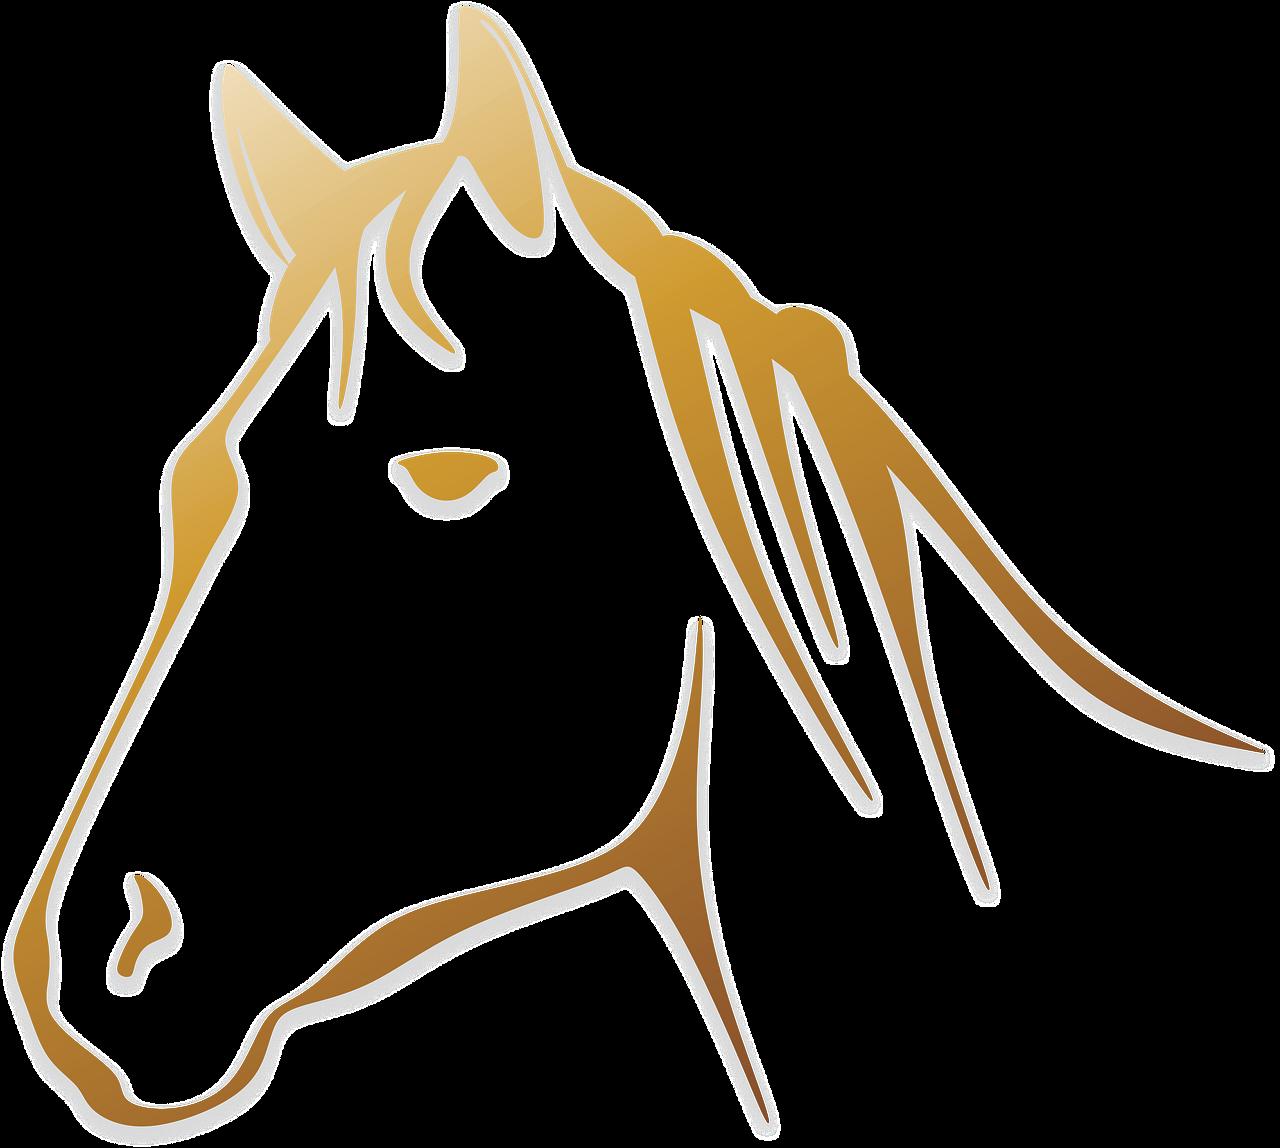 Horse Animal Horse Head Logo Image Gambar Sketsa